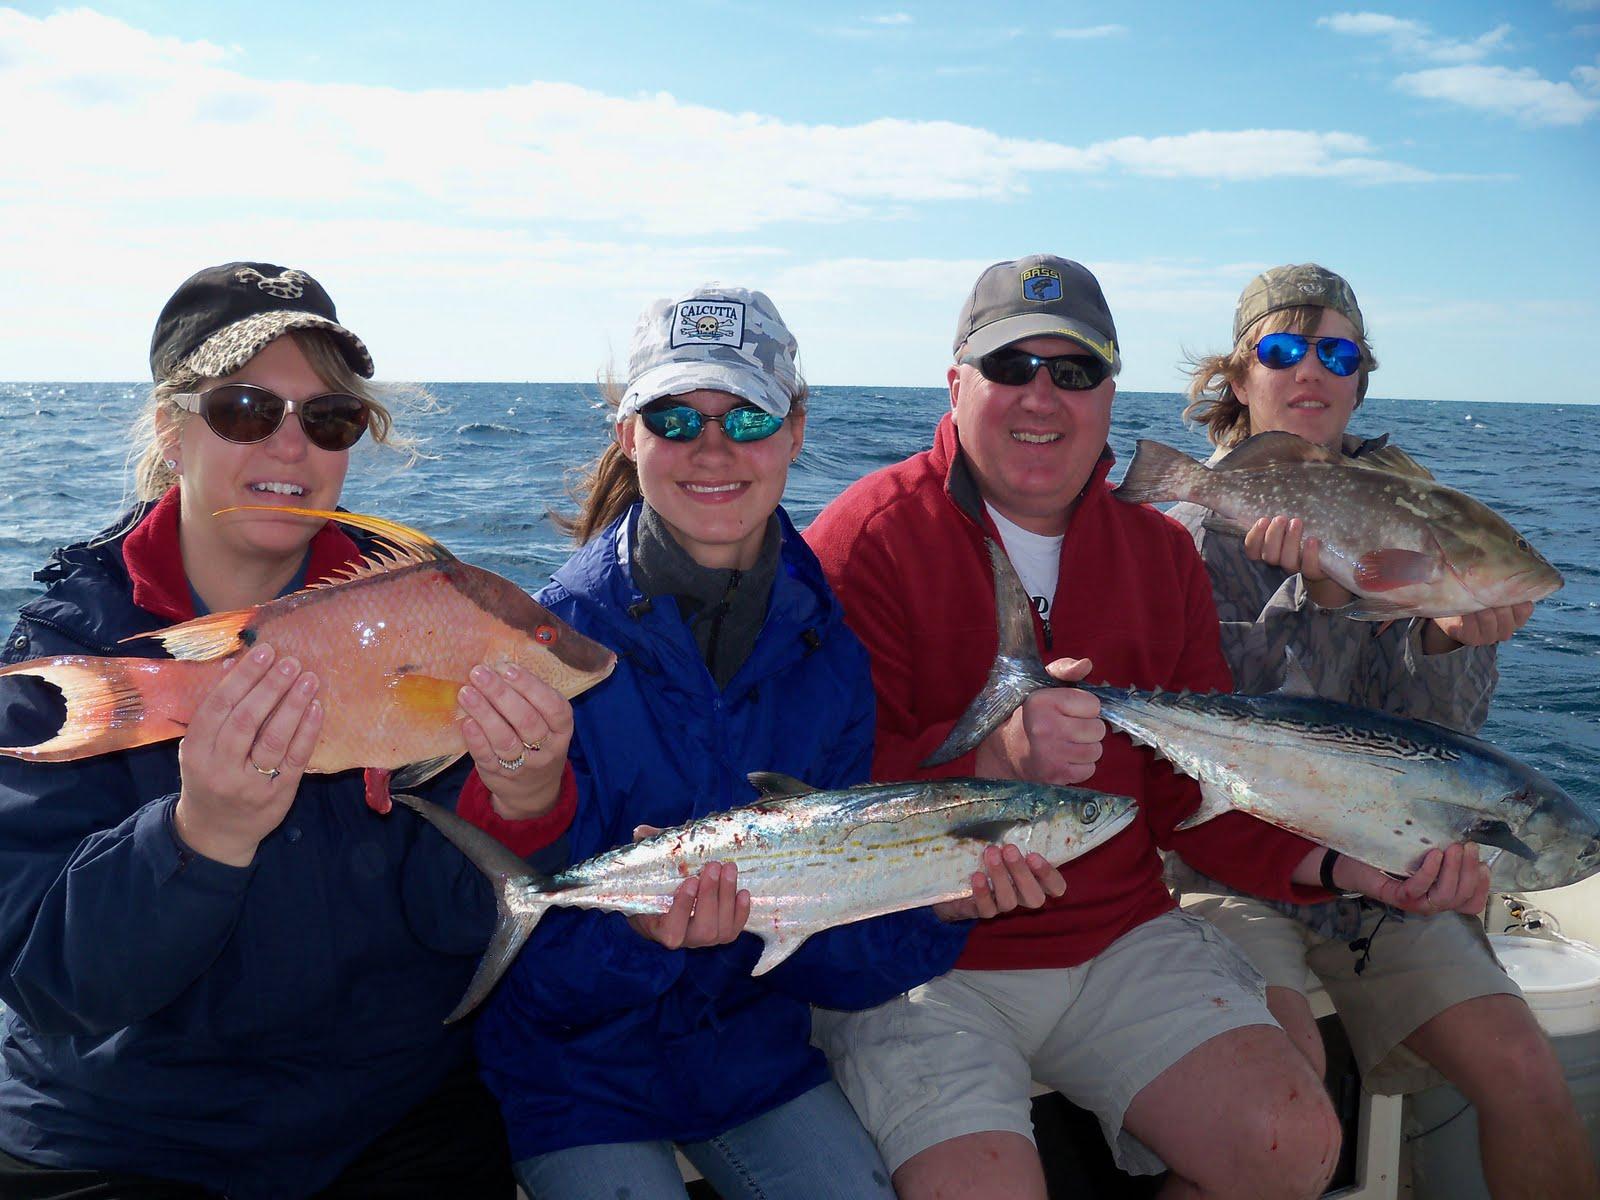 Fishing reports and tactics for fl keys charter fishing for Keys fishing report